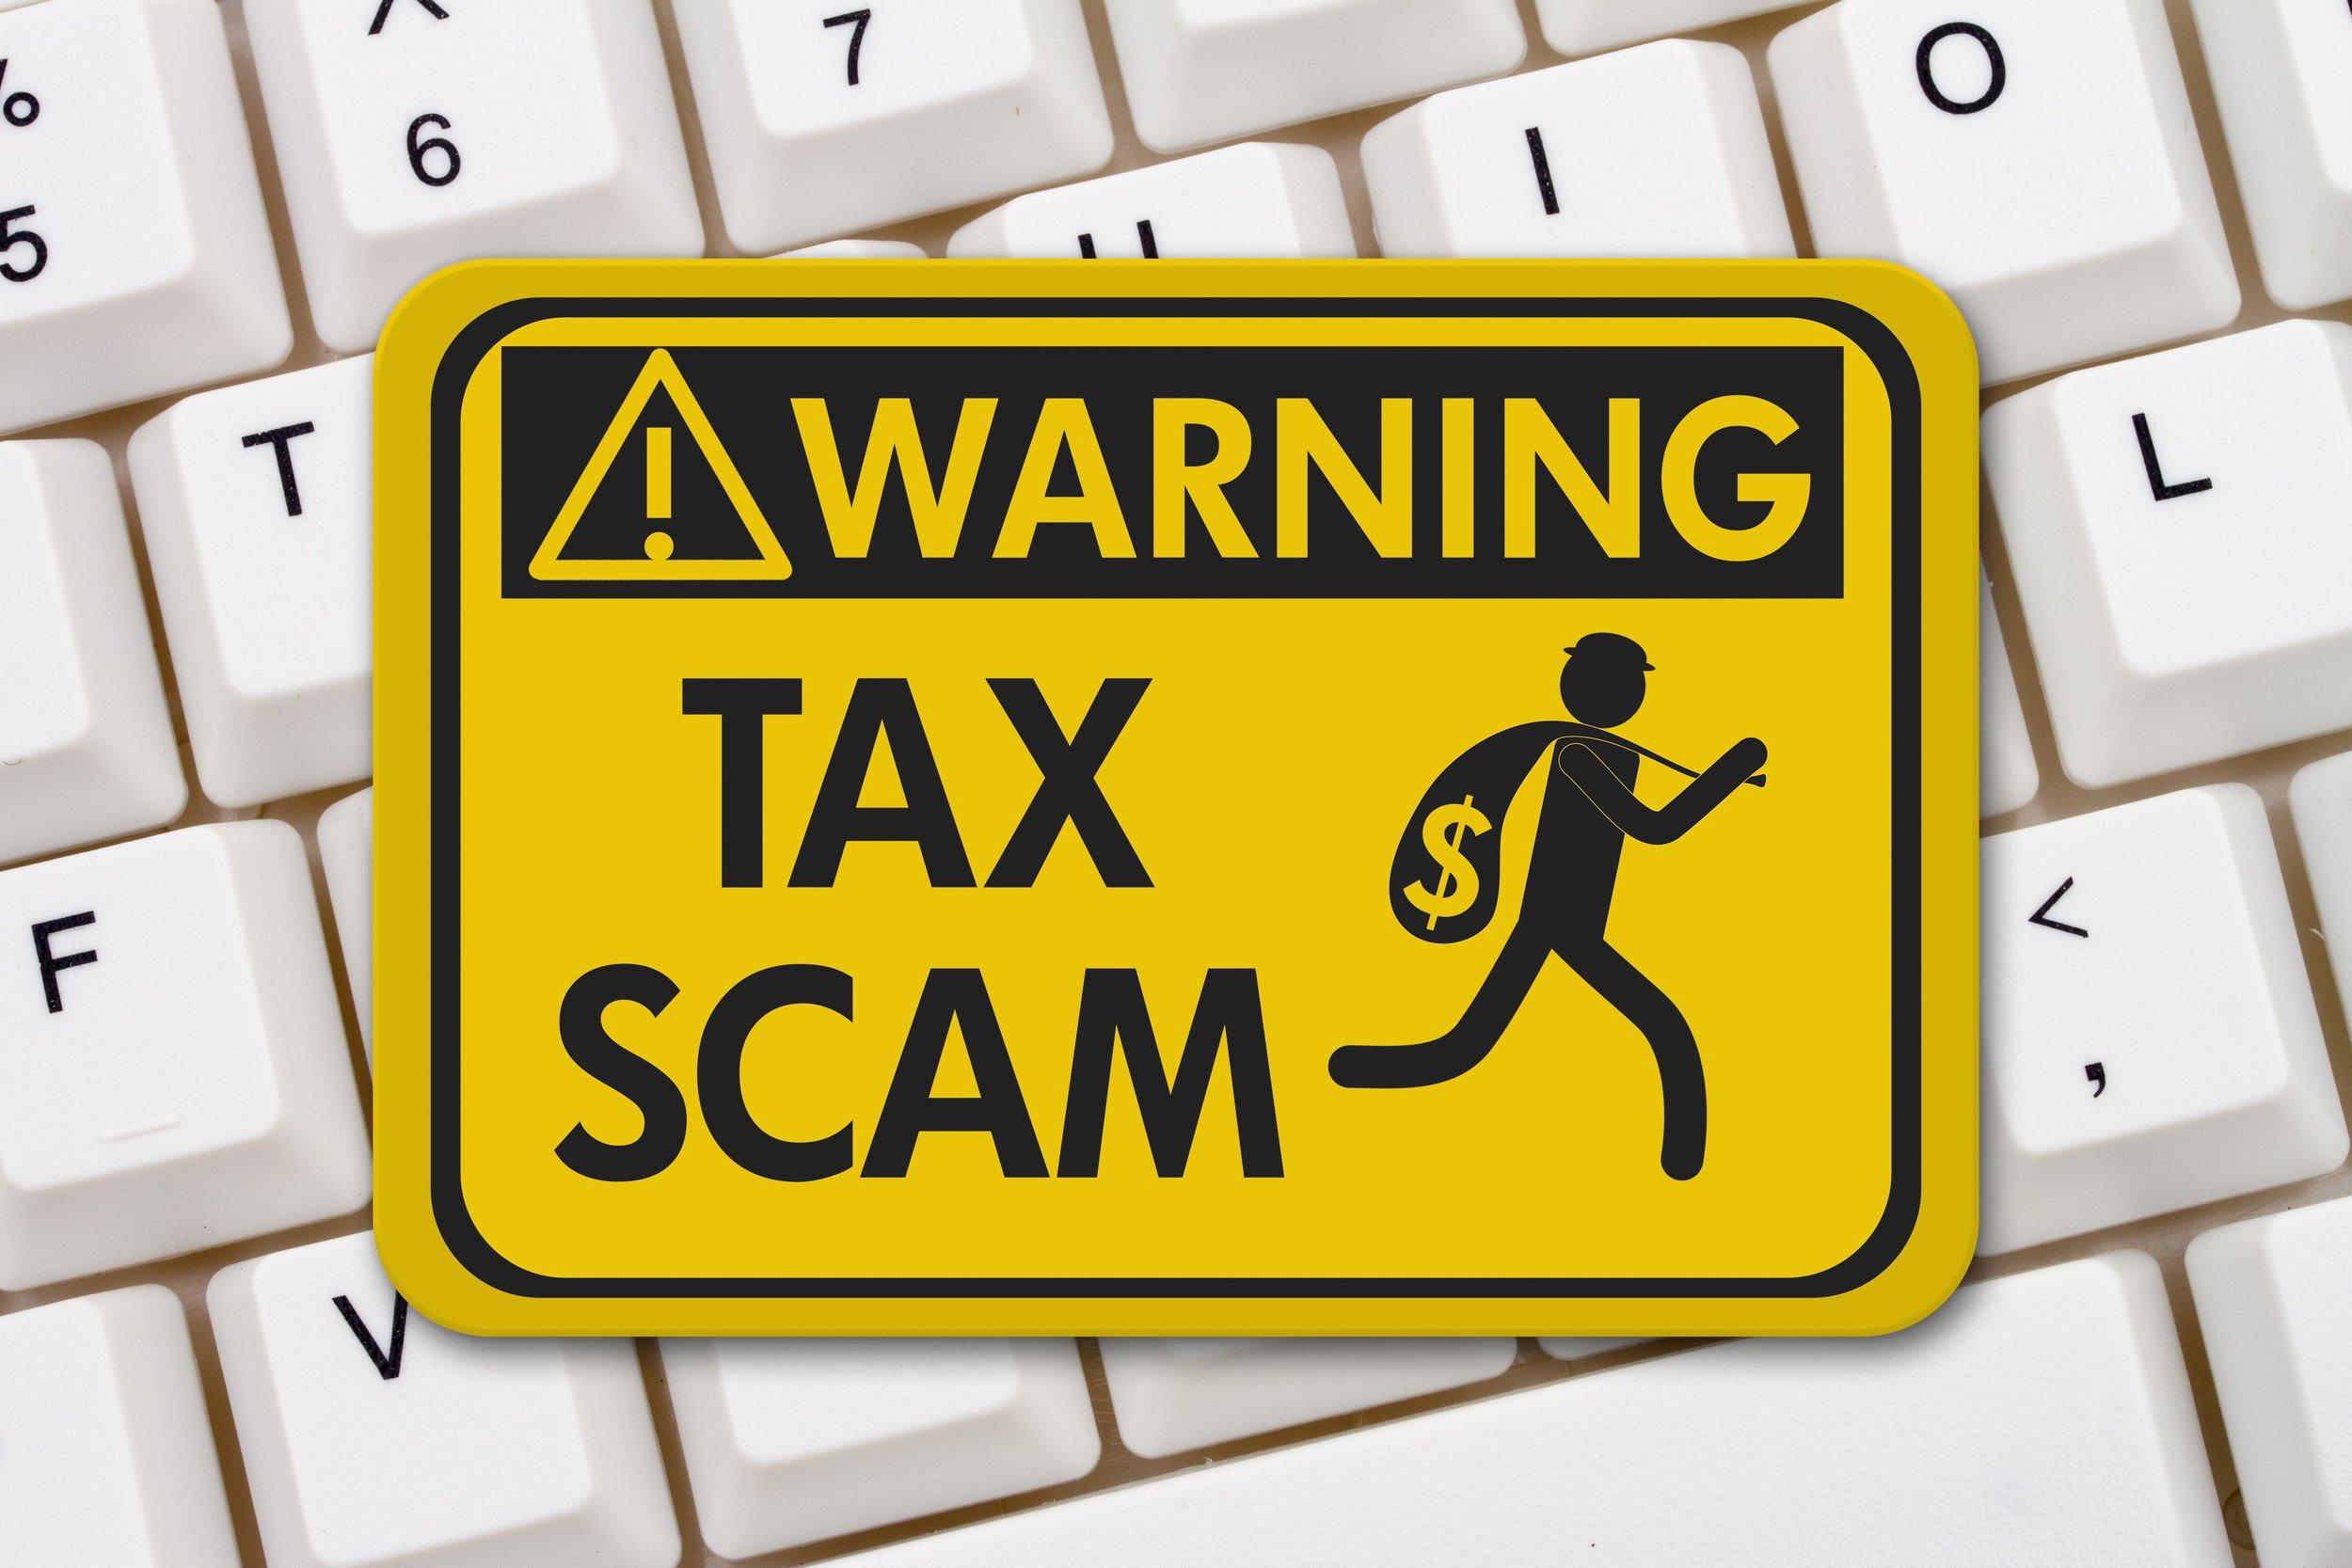 Tax Scam warning.jpg